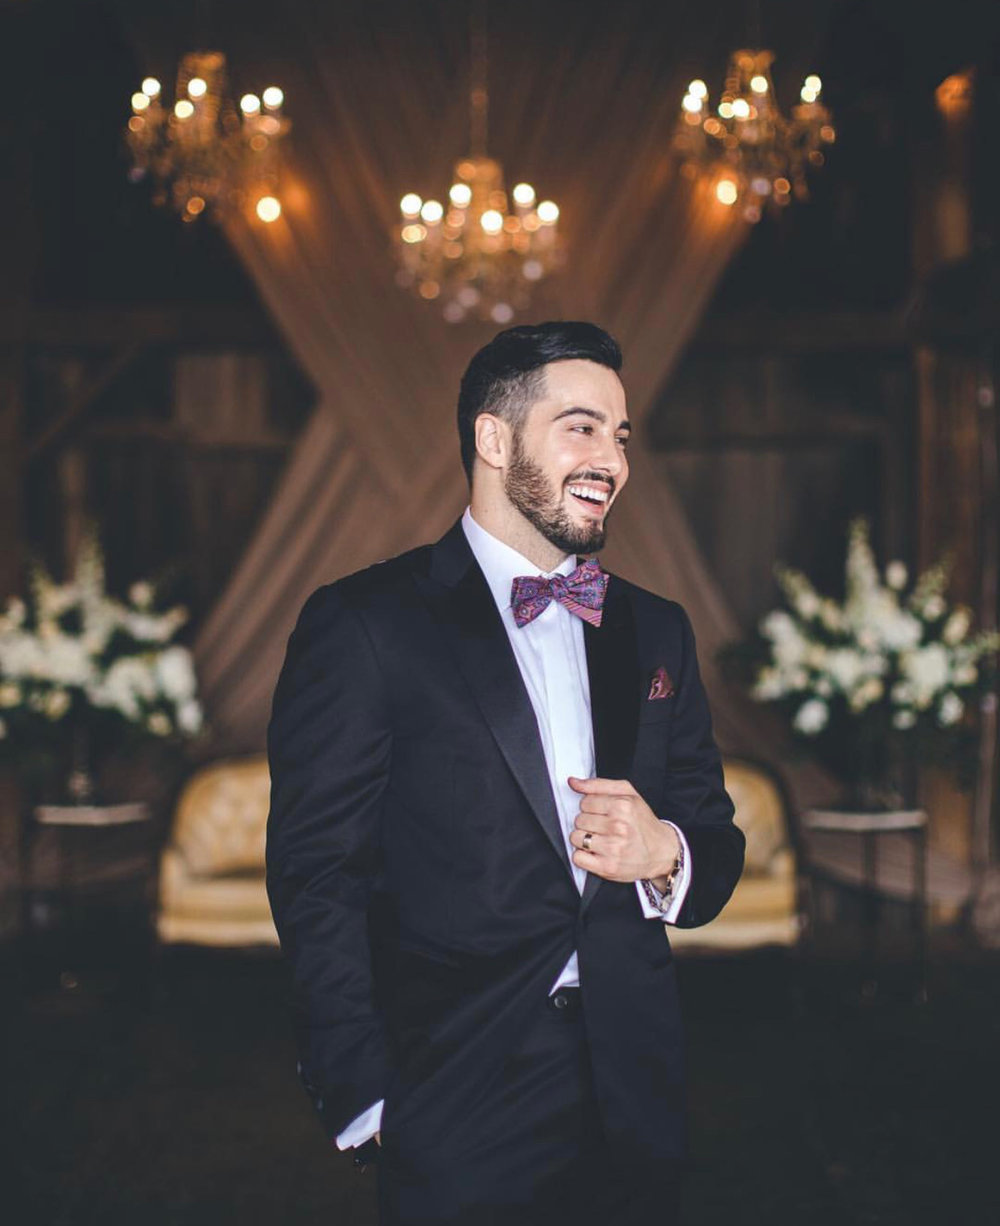 cincinnati-wedding-attire.jpeg